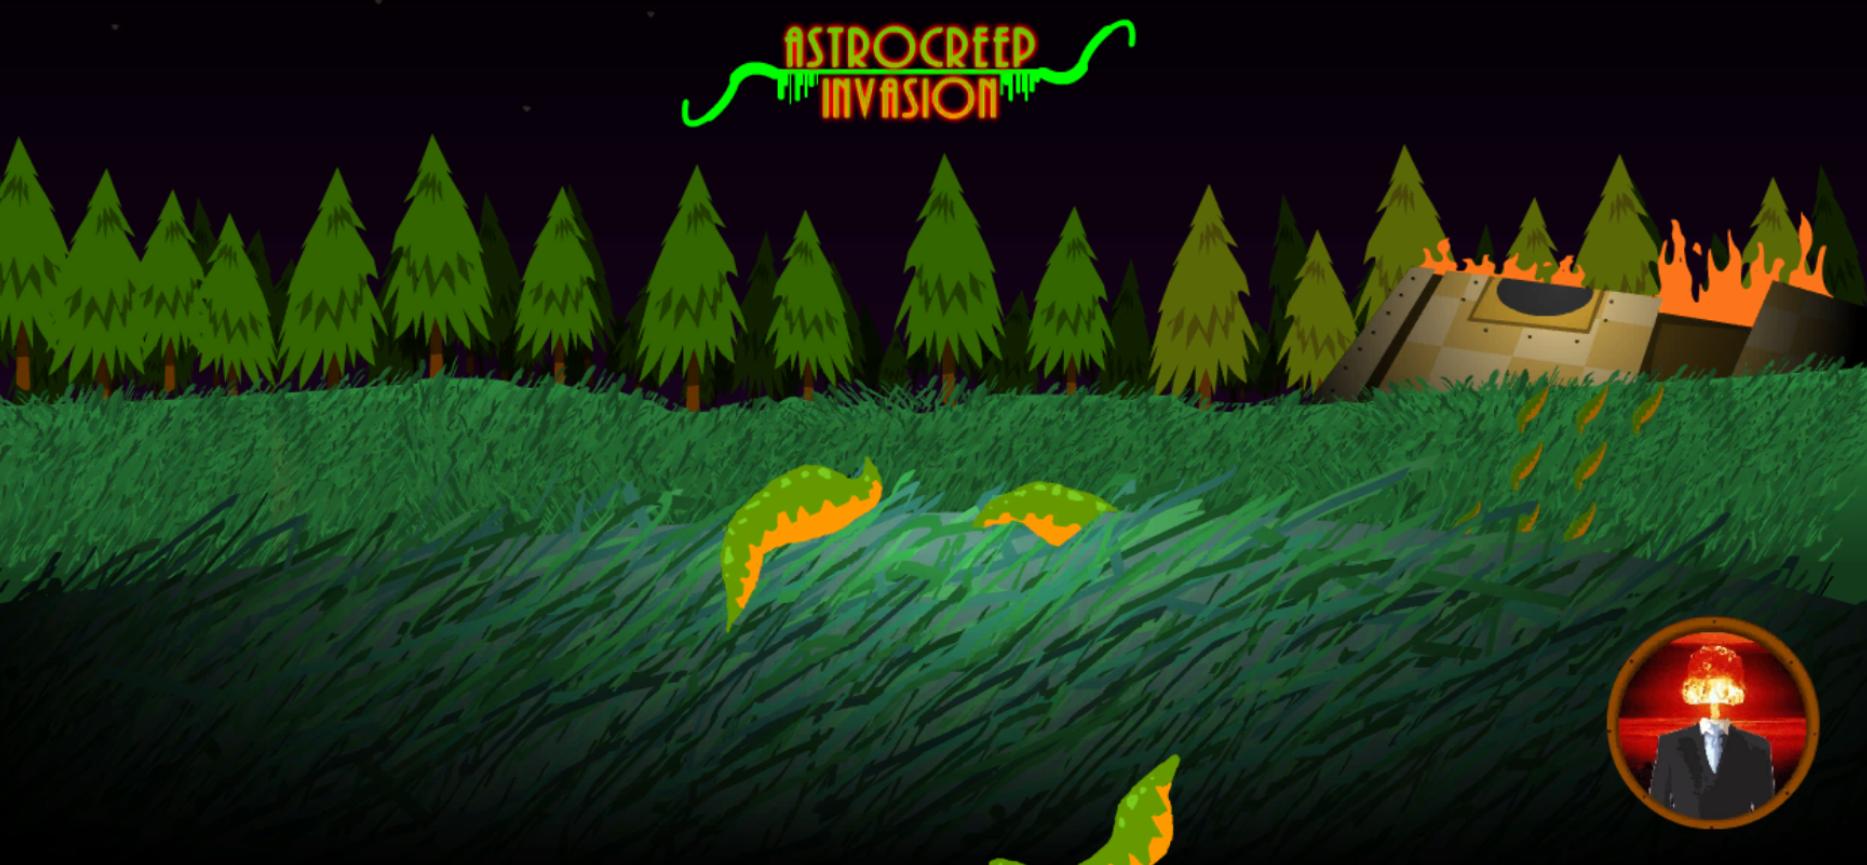 Astrocreep : Invasion!